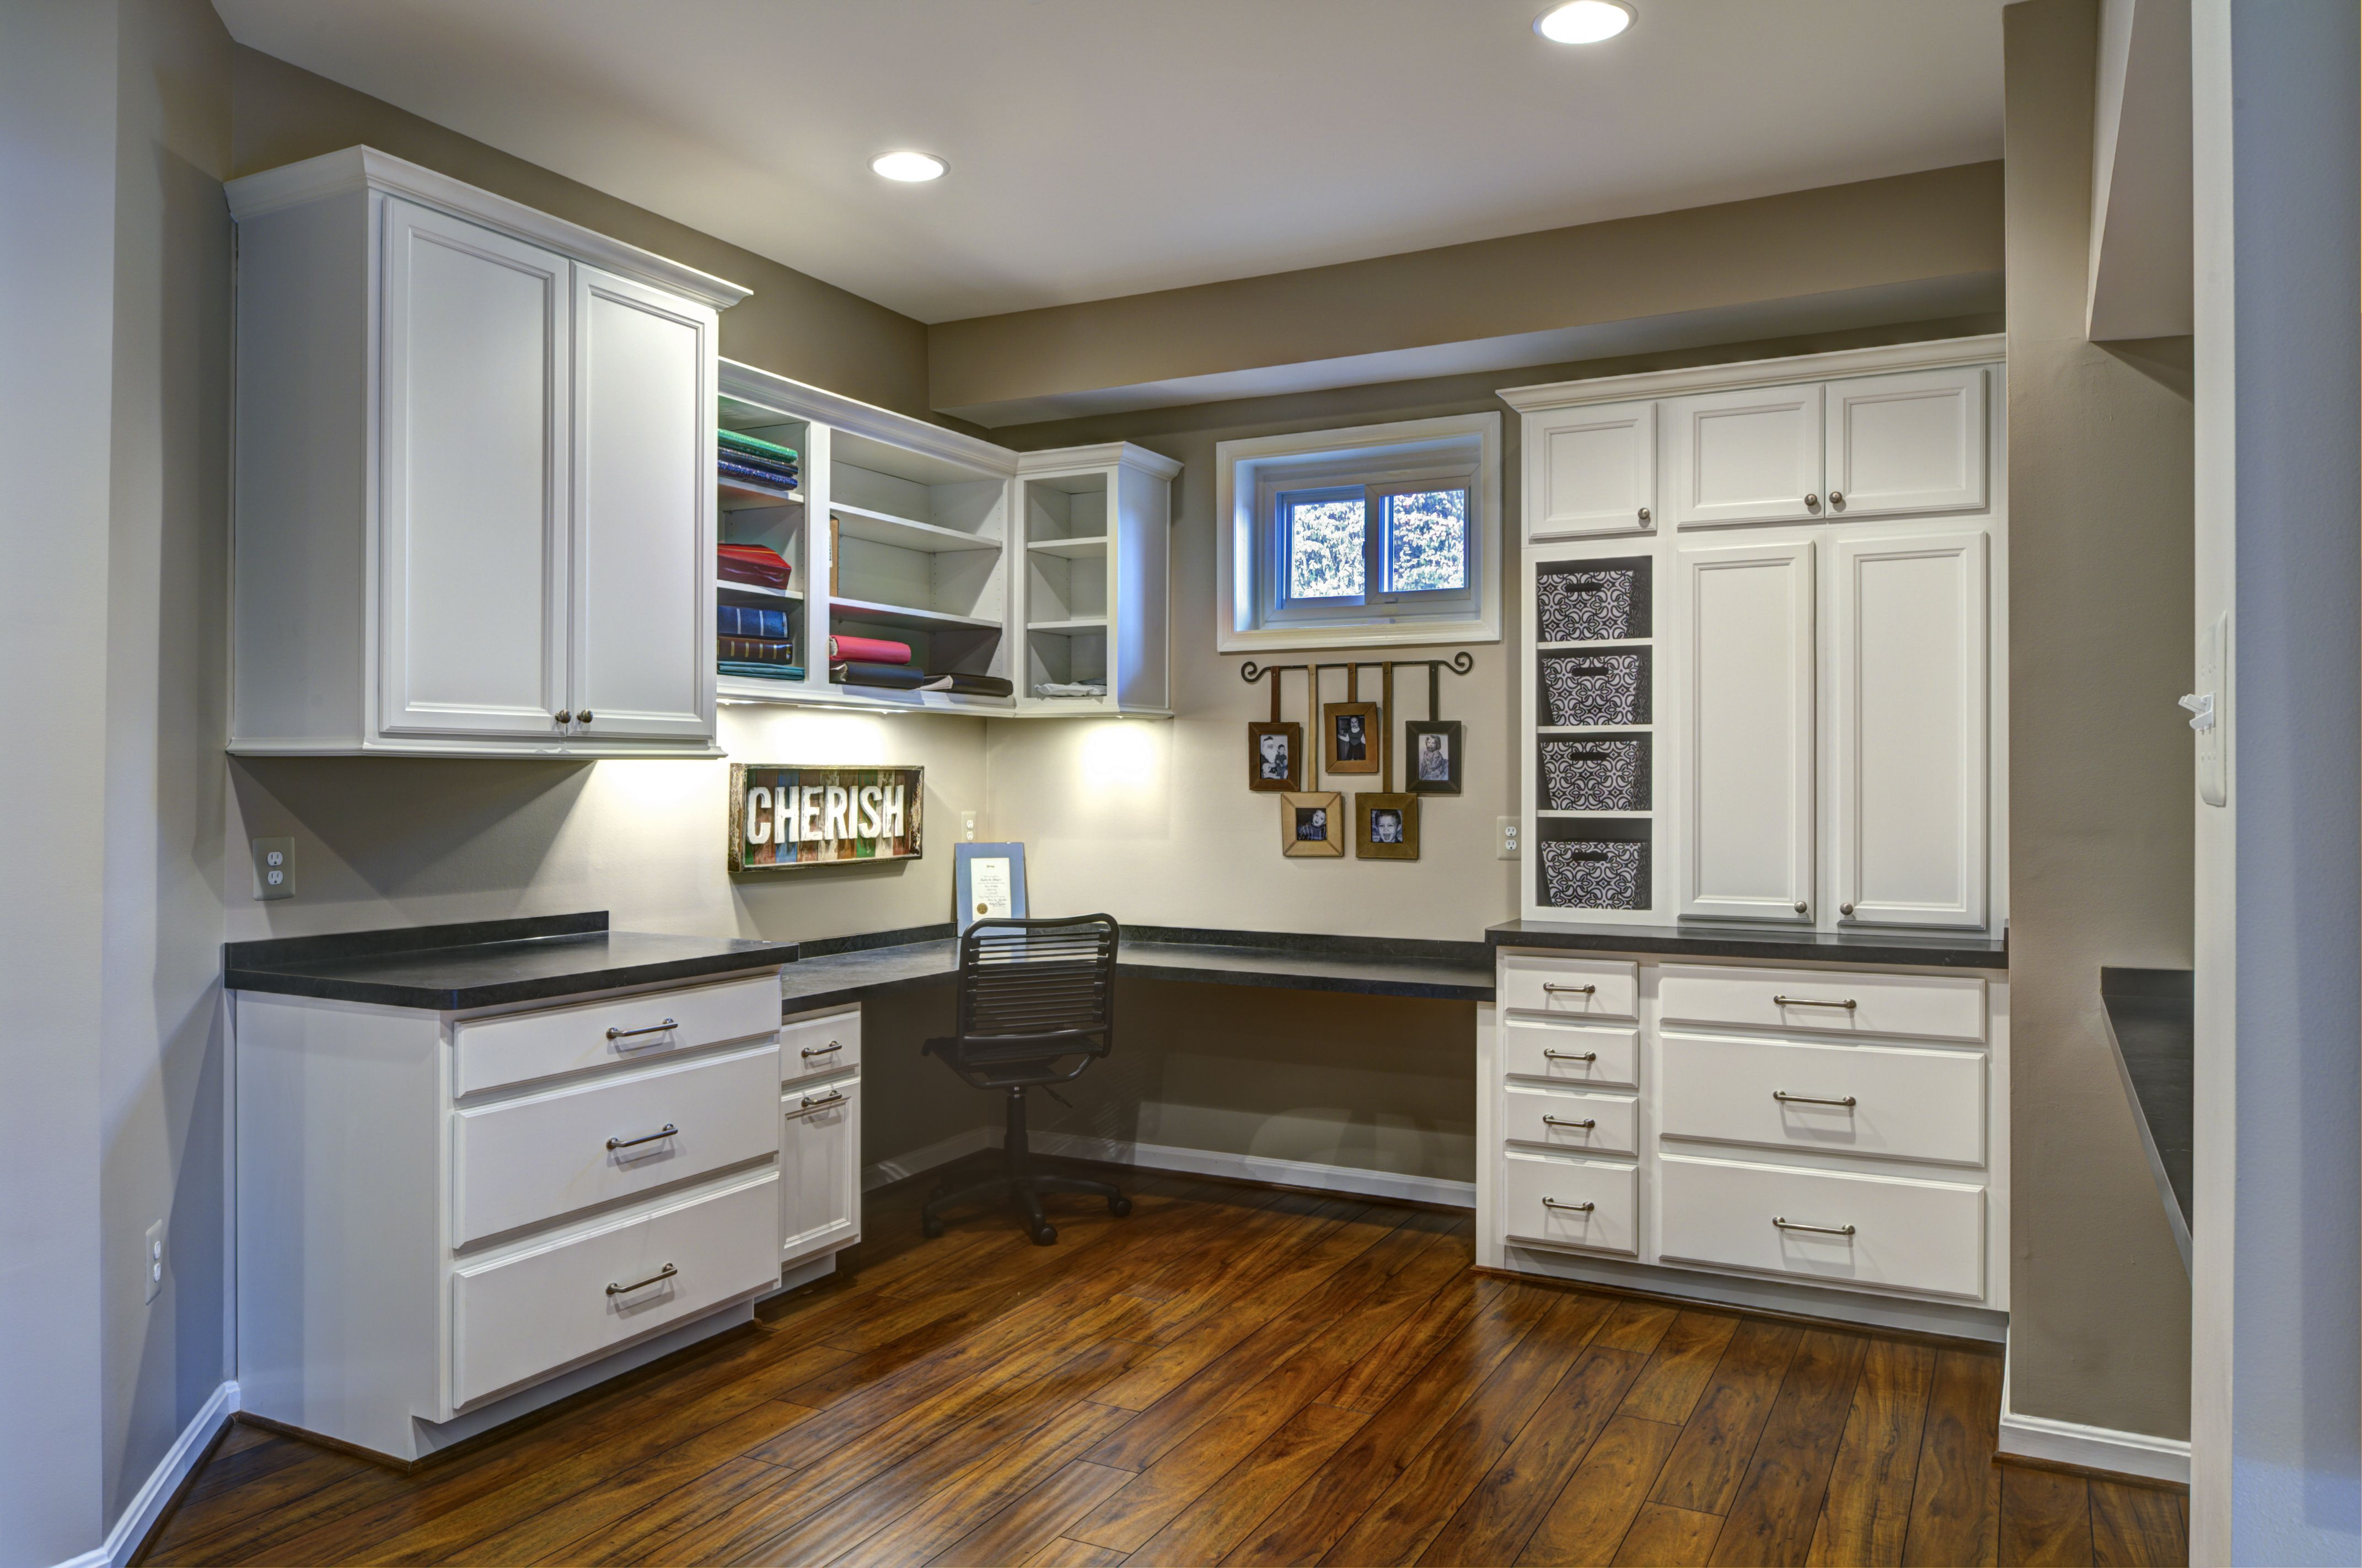 1000 images about studio organizado on pinterest. Black Bedroom Furniture Sets. Home Design Ideas